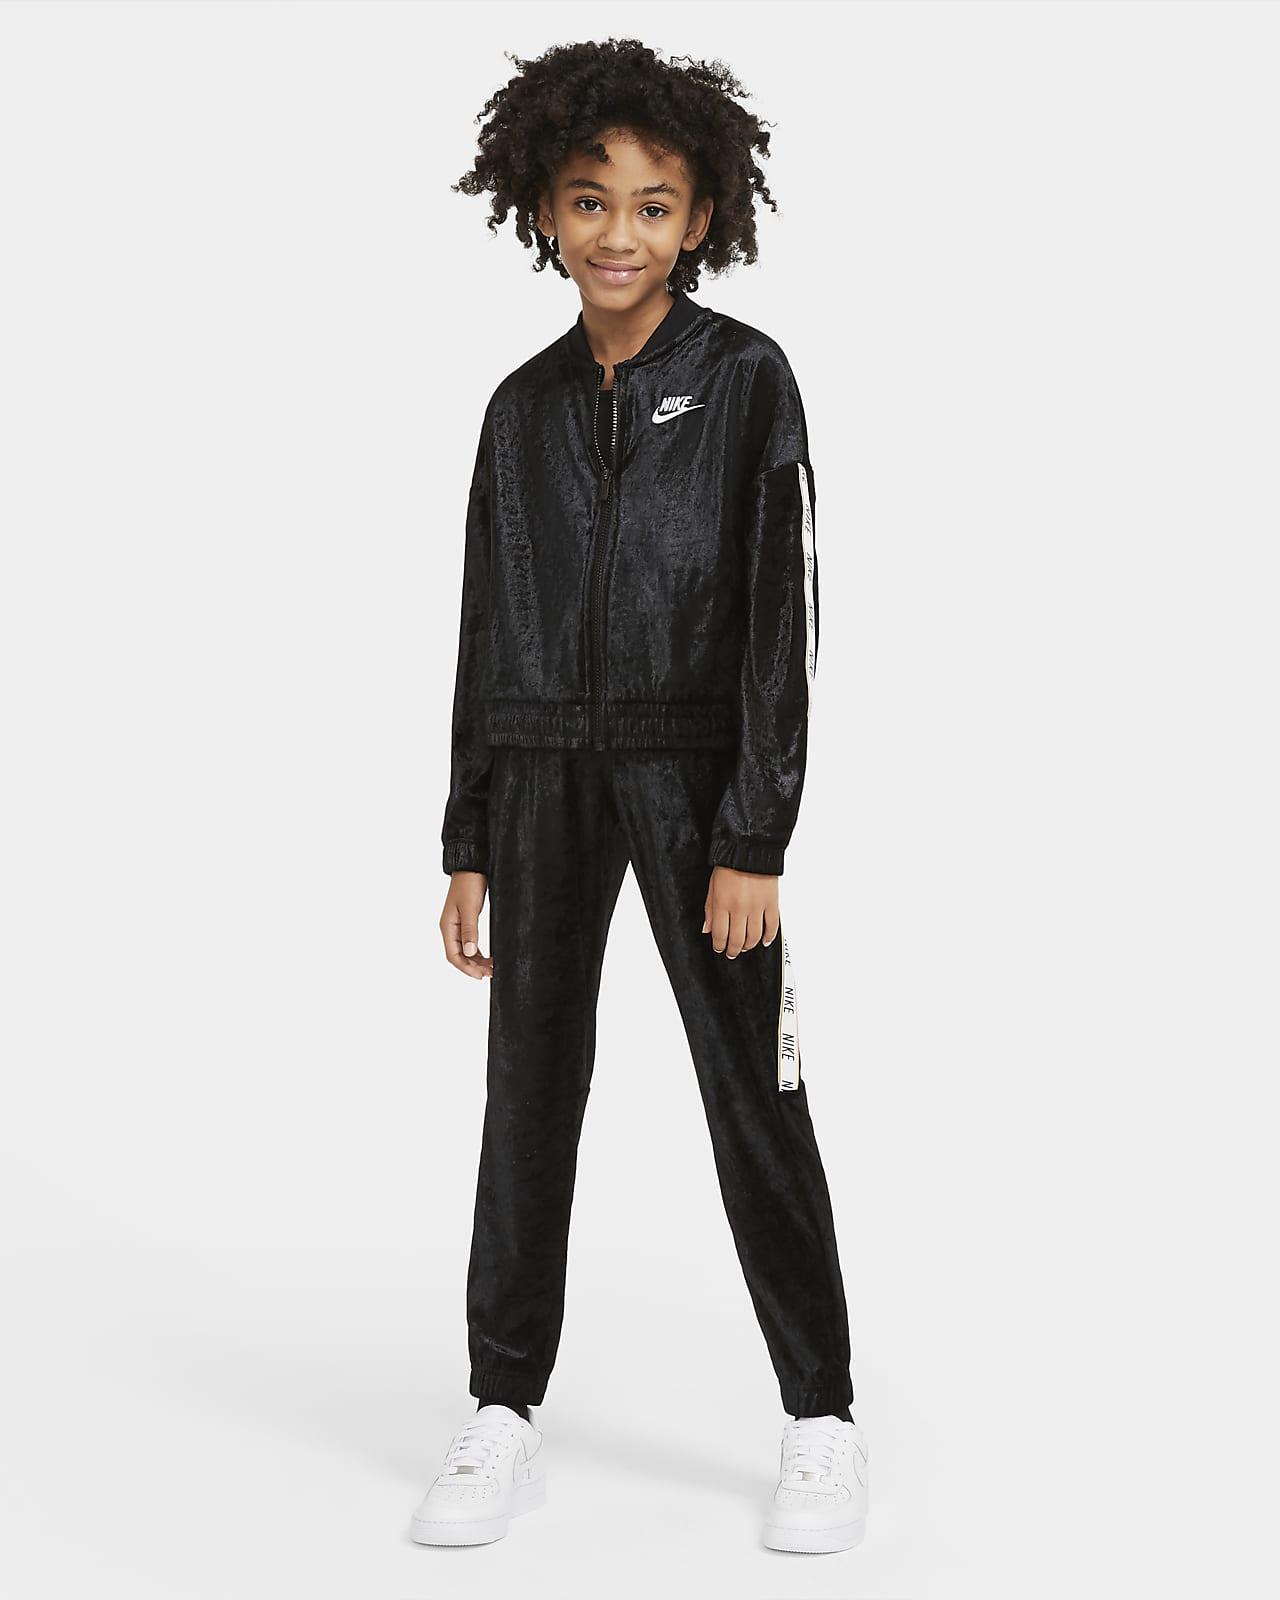 Nike Sportswear Trainingsanzug für ältere Kinder (Mädchen)